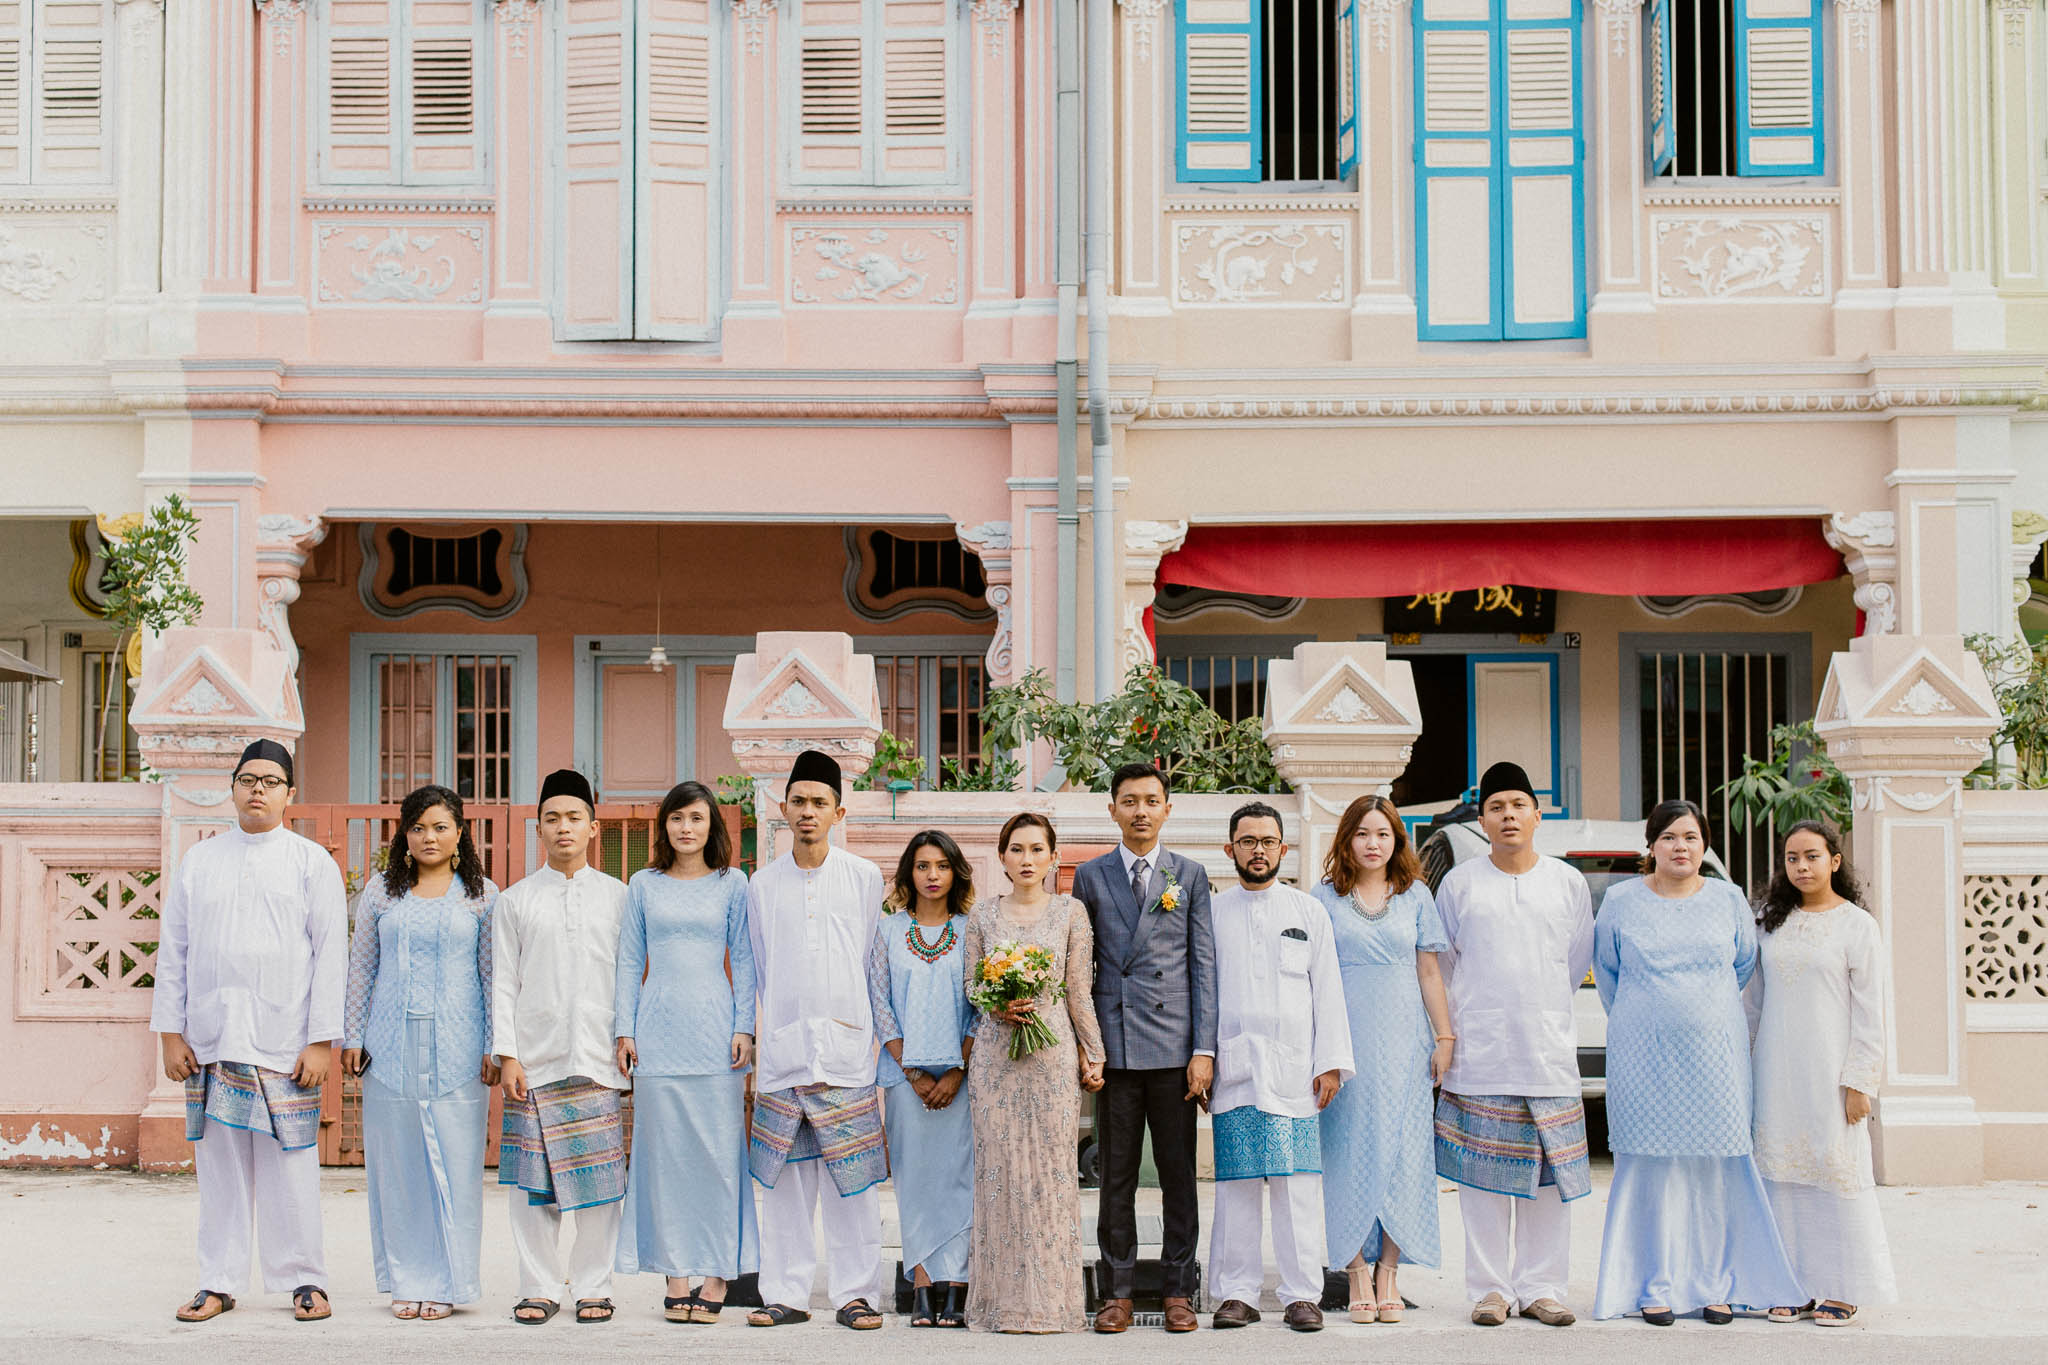 singapore-wedding-photographer-wedding-nufail-addafiq-068.jpg